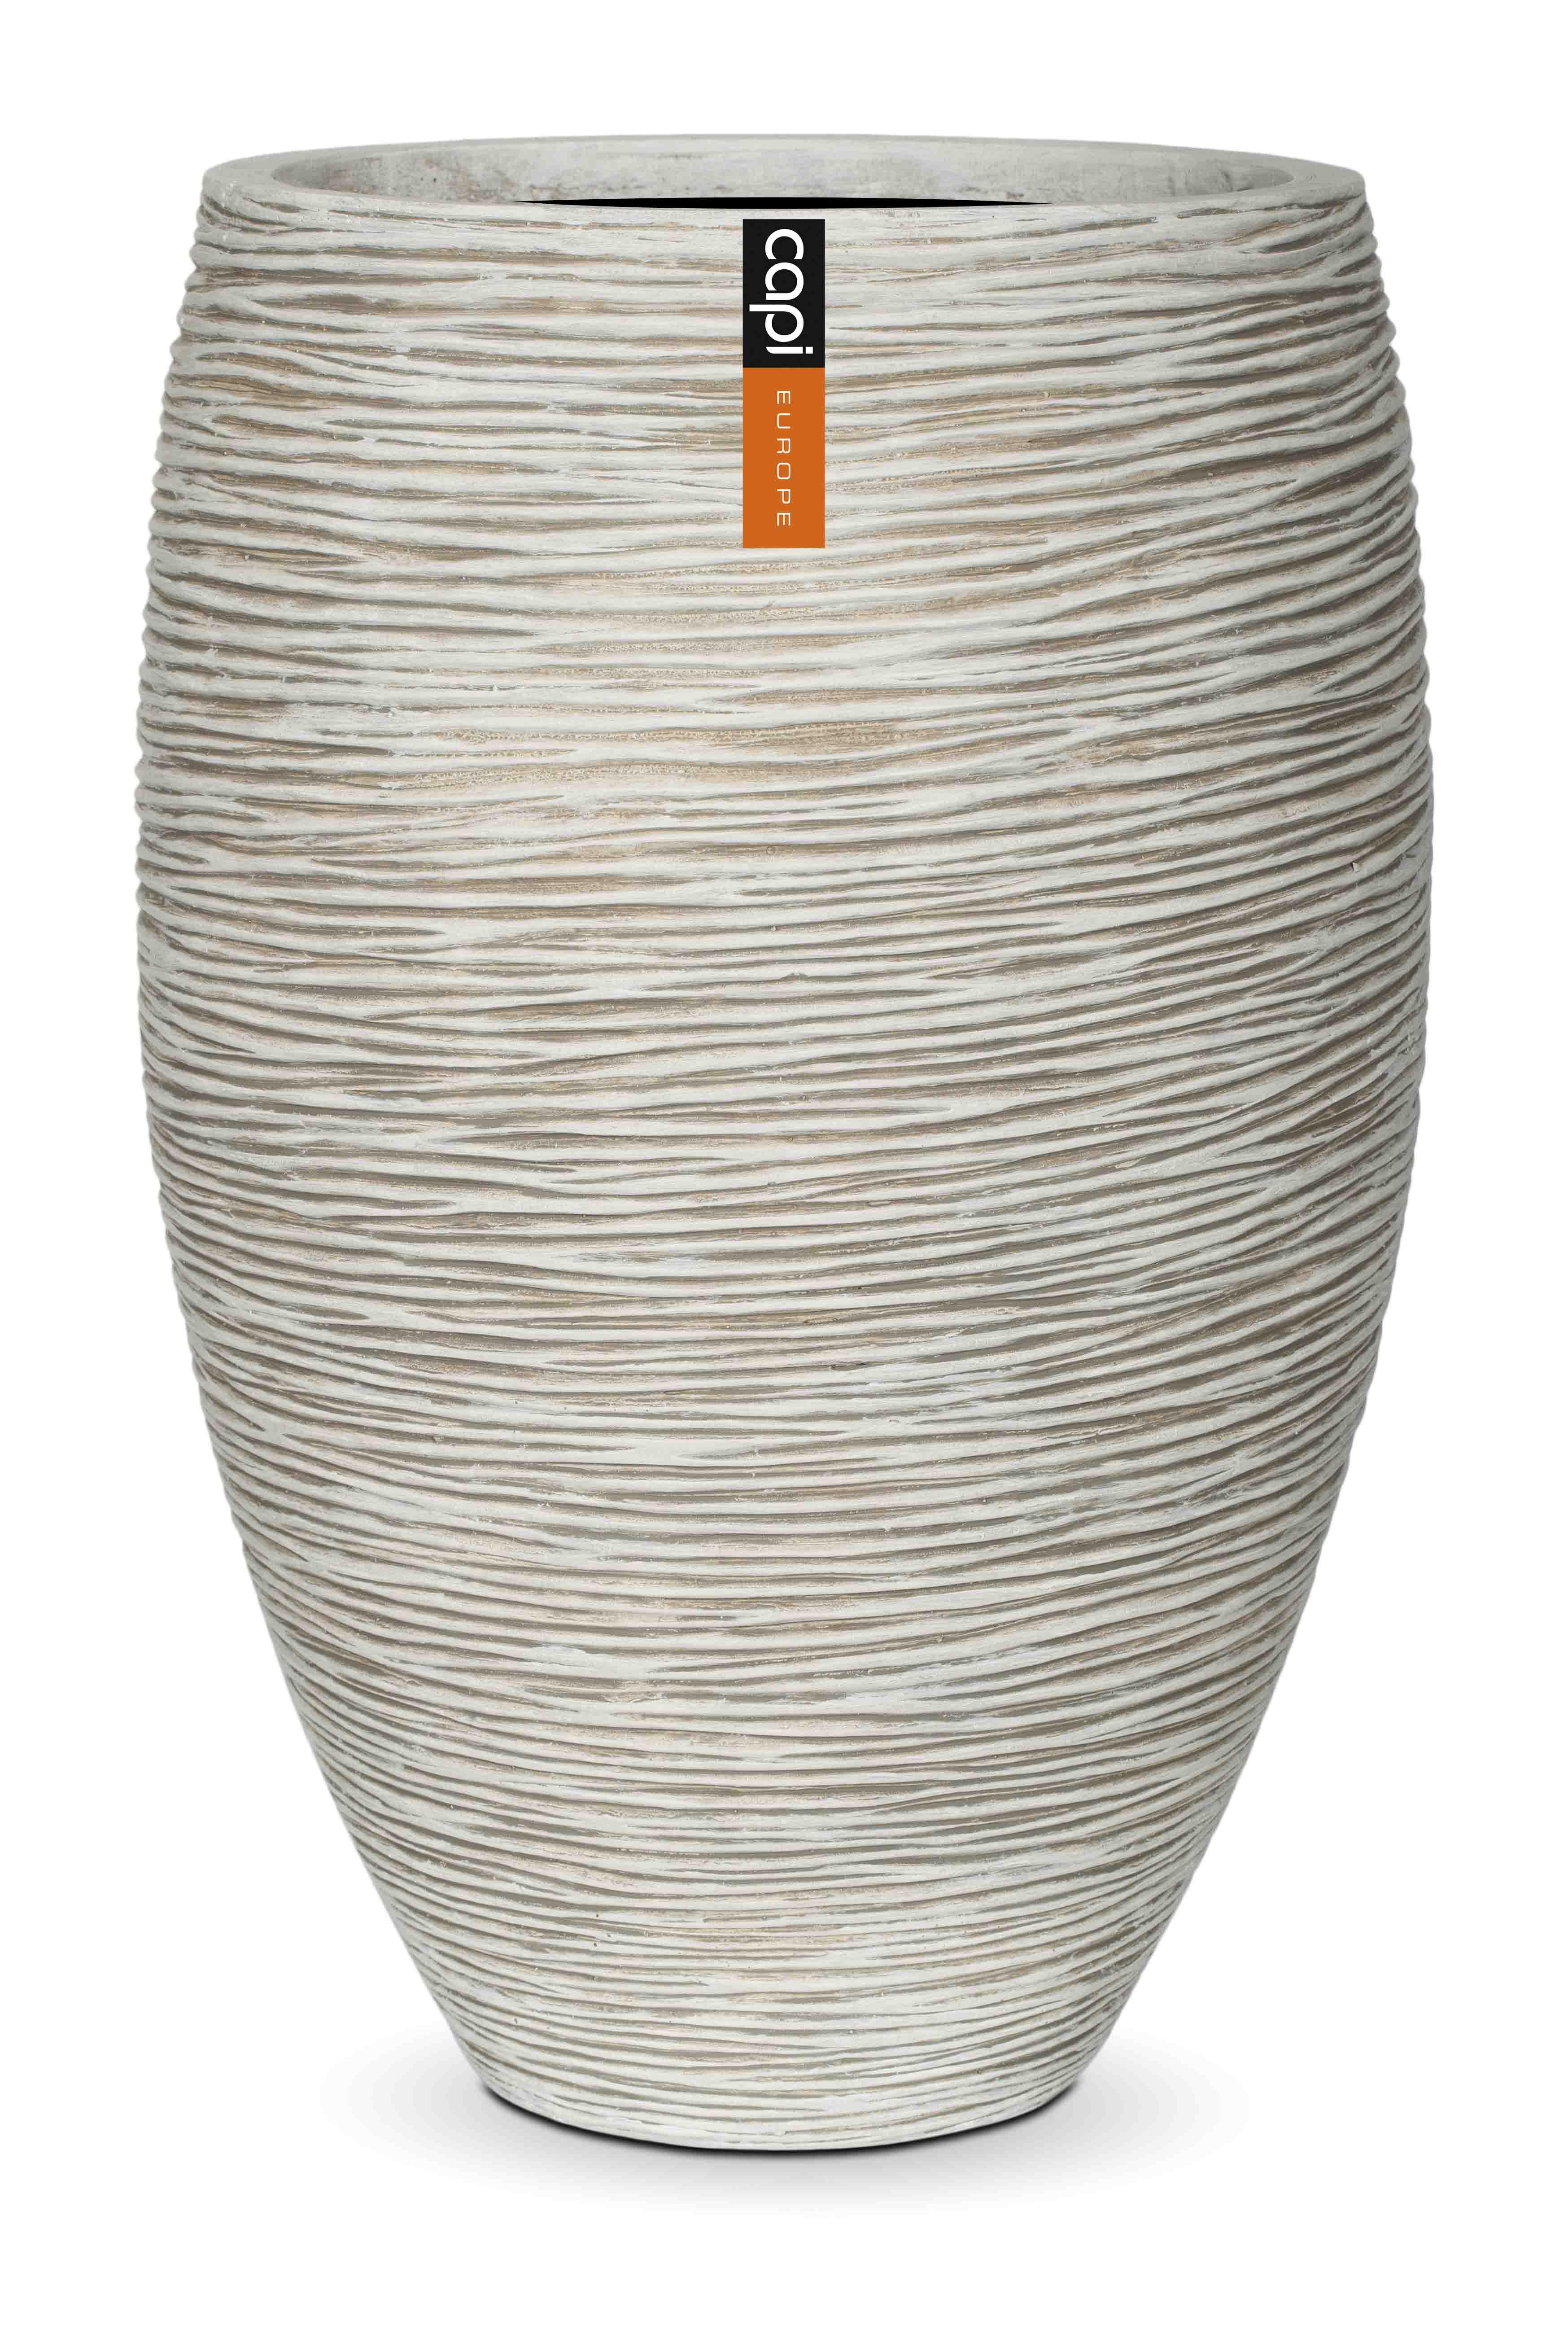 Capi Vaas Nature Ivoor Rib 39 x 60 cm